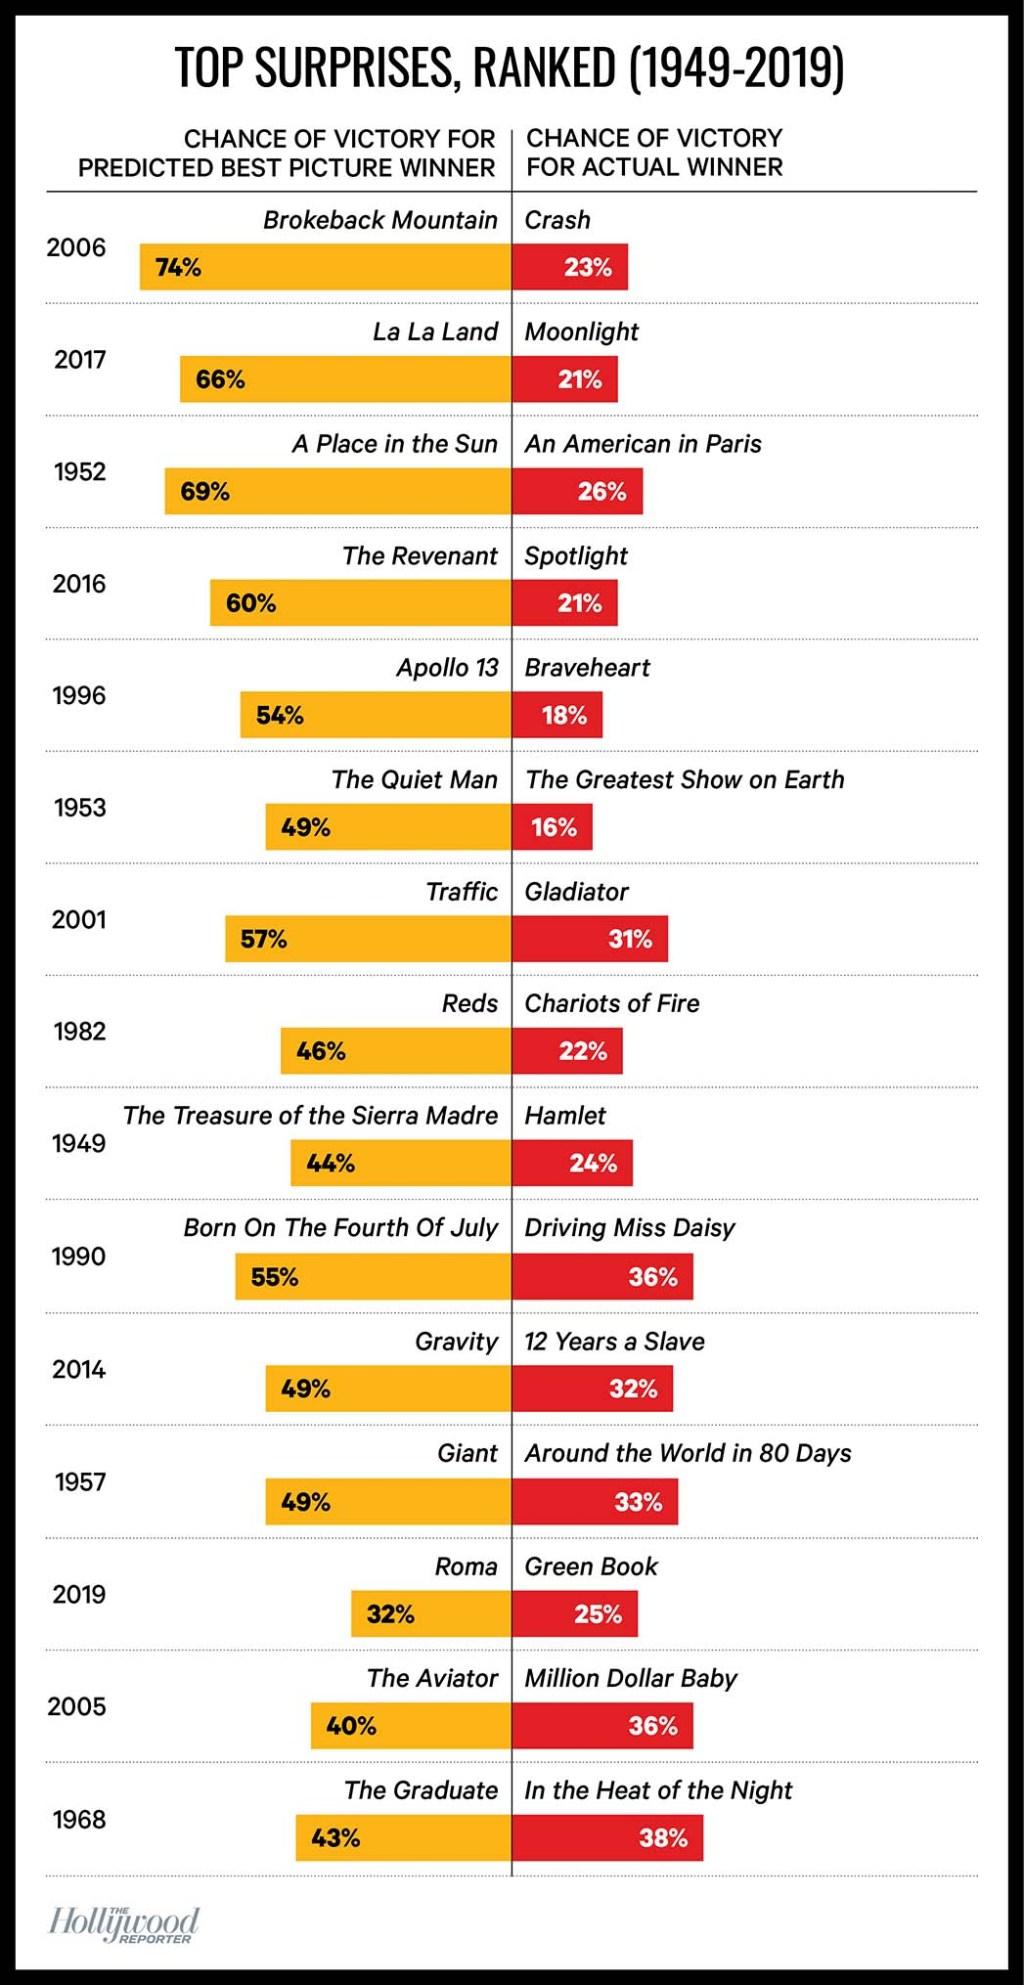 Top Surprises, Ranked Chart